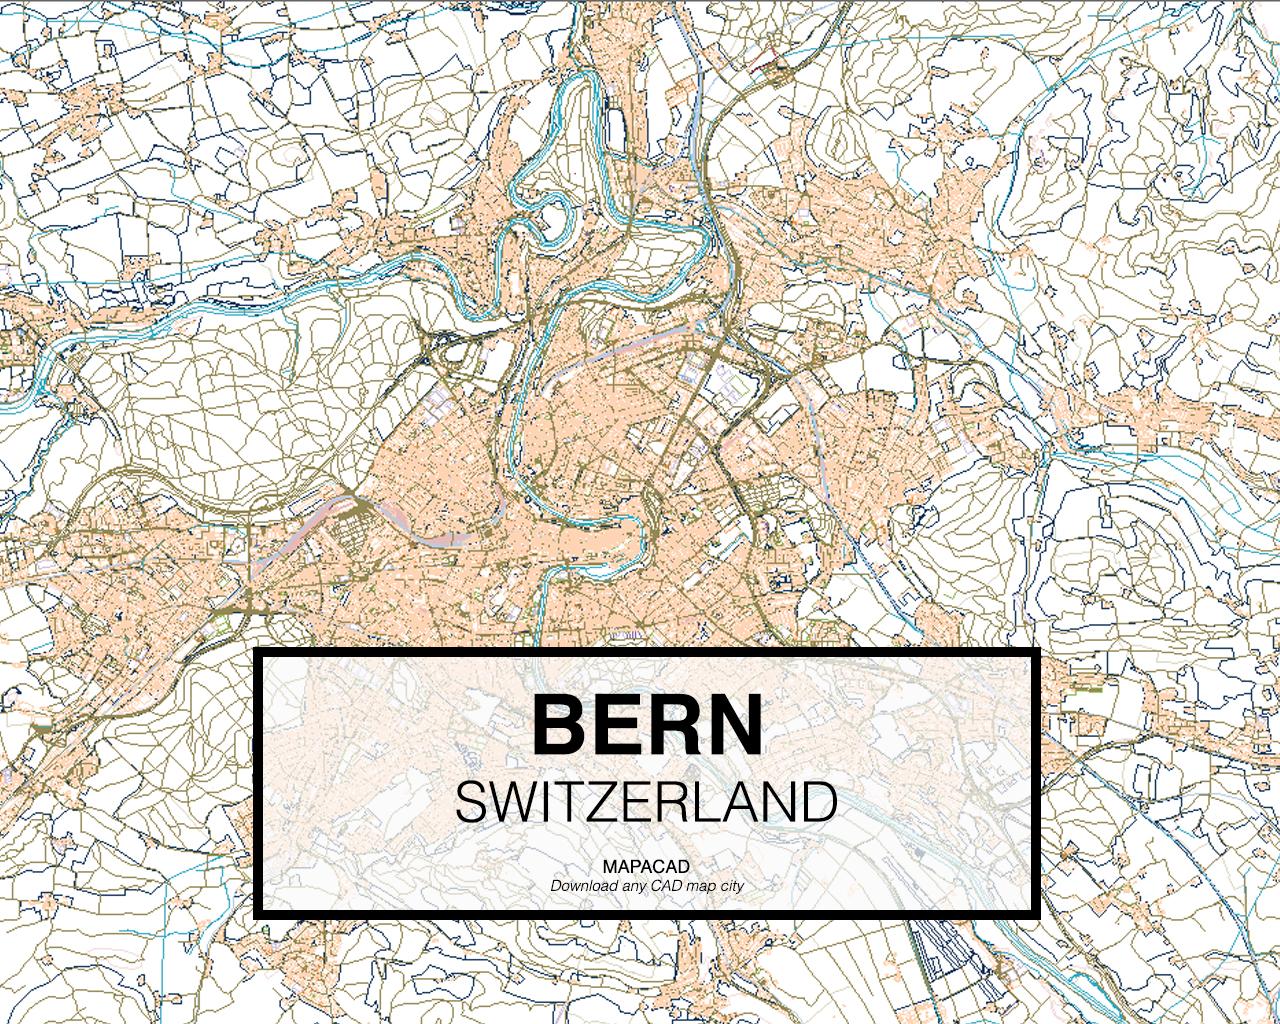 Download bern dwg mapacad bern switzerland 01 mapacad download map cad dwg gumiabroncs Image collections